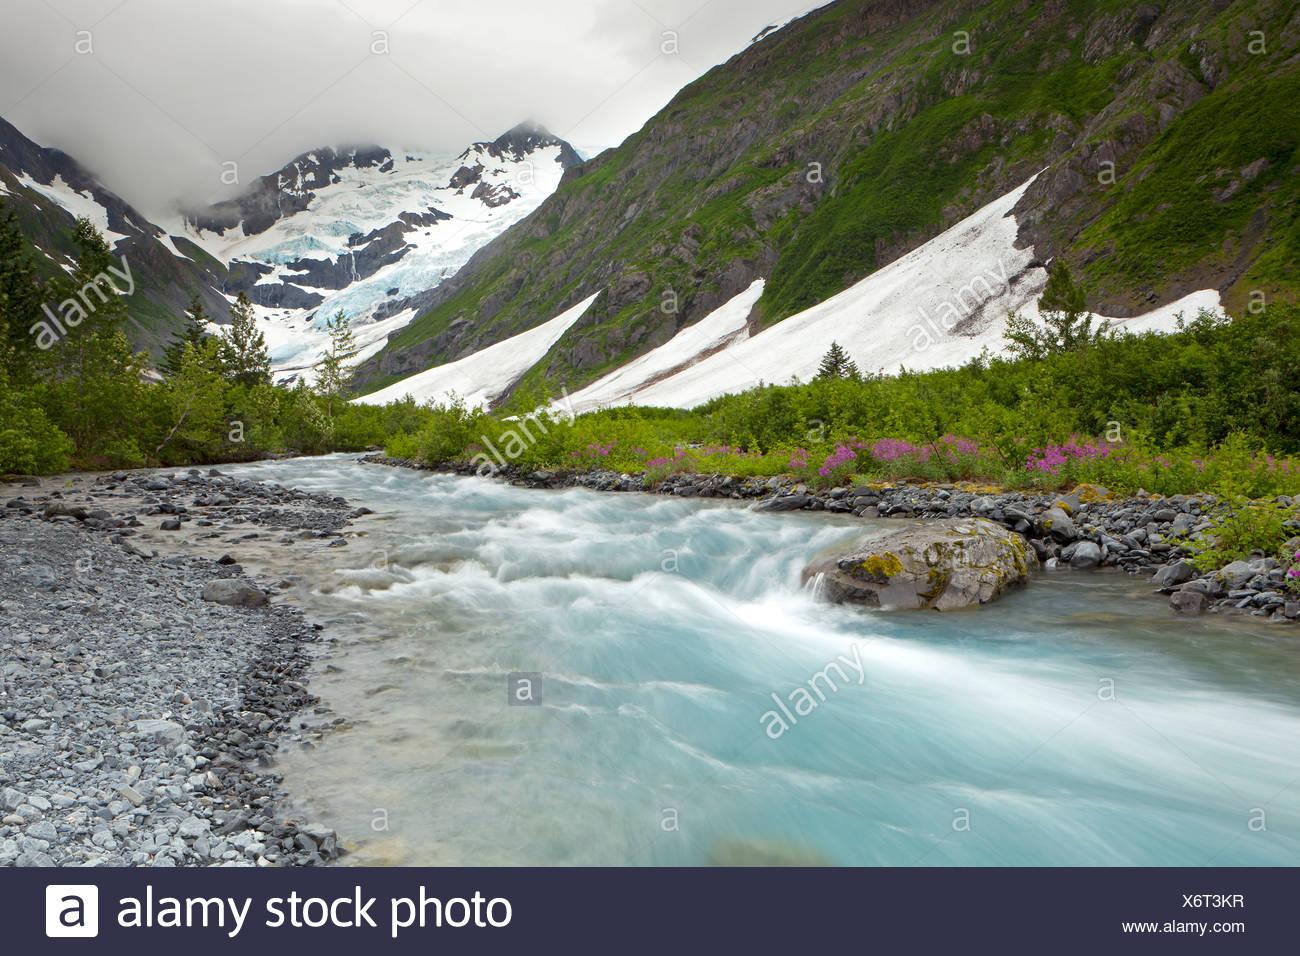 Byron Glacier and river near the Portage Glacier in the Chugach Mountains, Kenai Peninsula, Alaska, USA - Stock Image